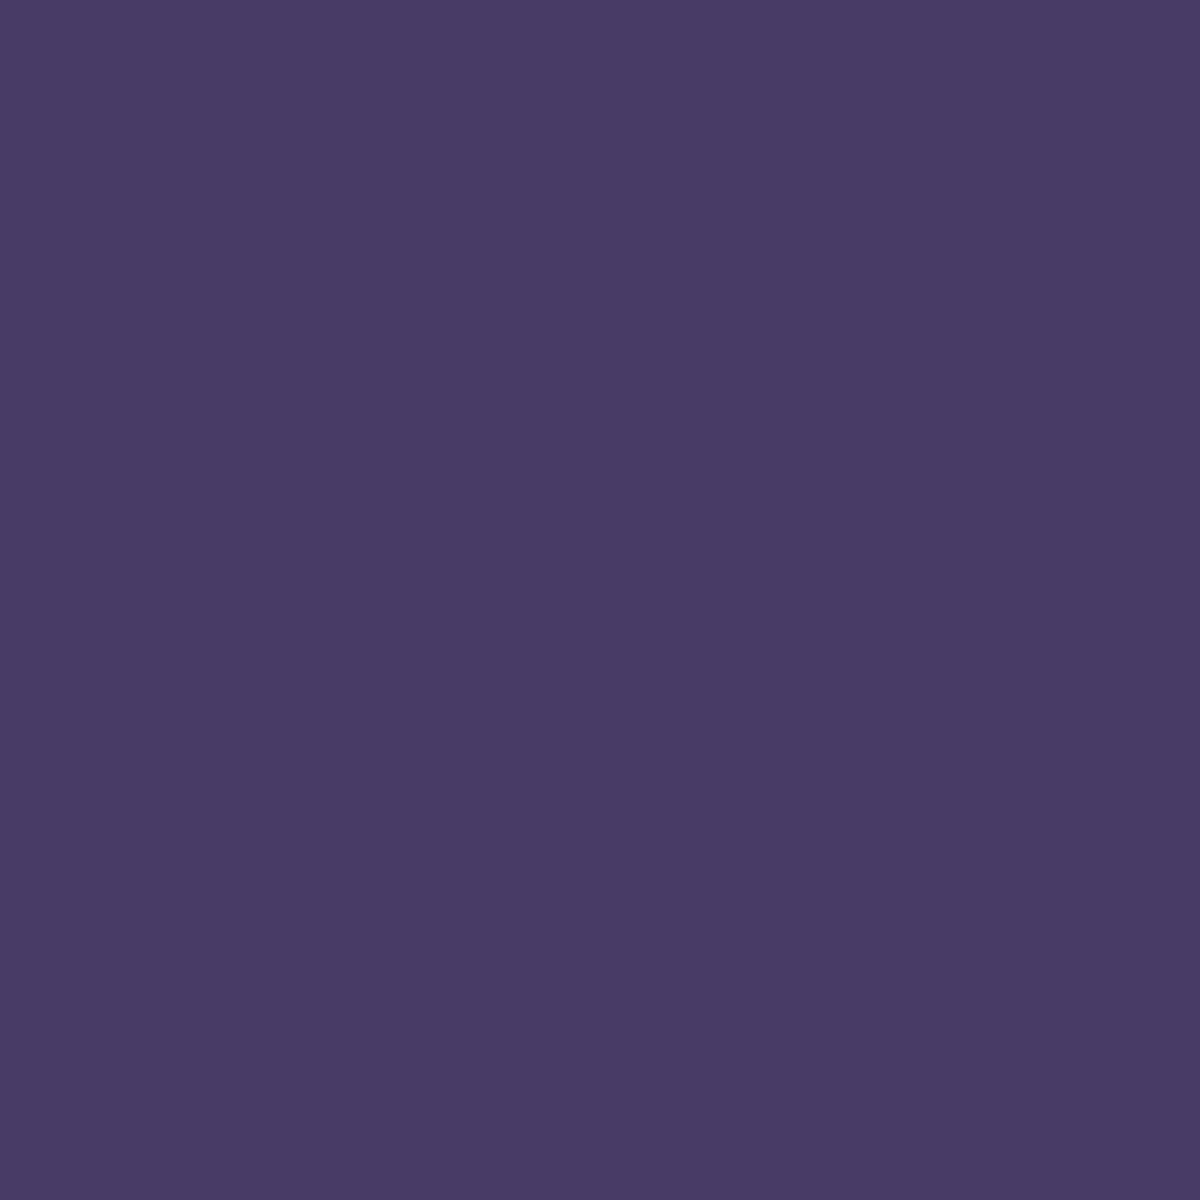 Vopsea lavabilă Chalkboard Gentle Violet, Benjamin Moore, 1 litru / cutie